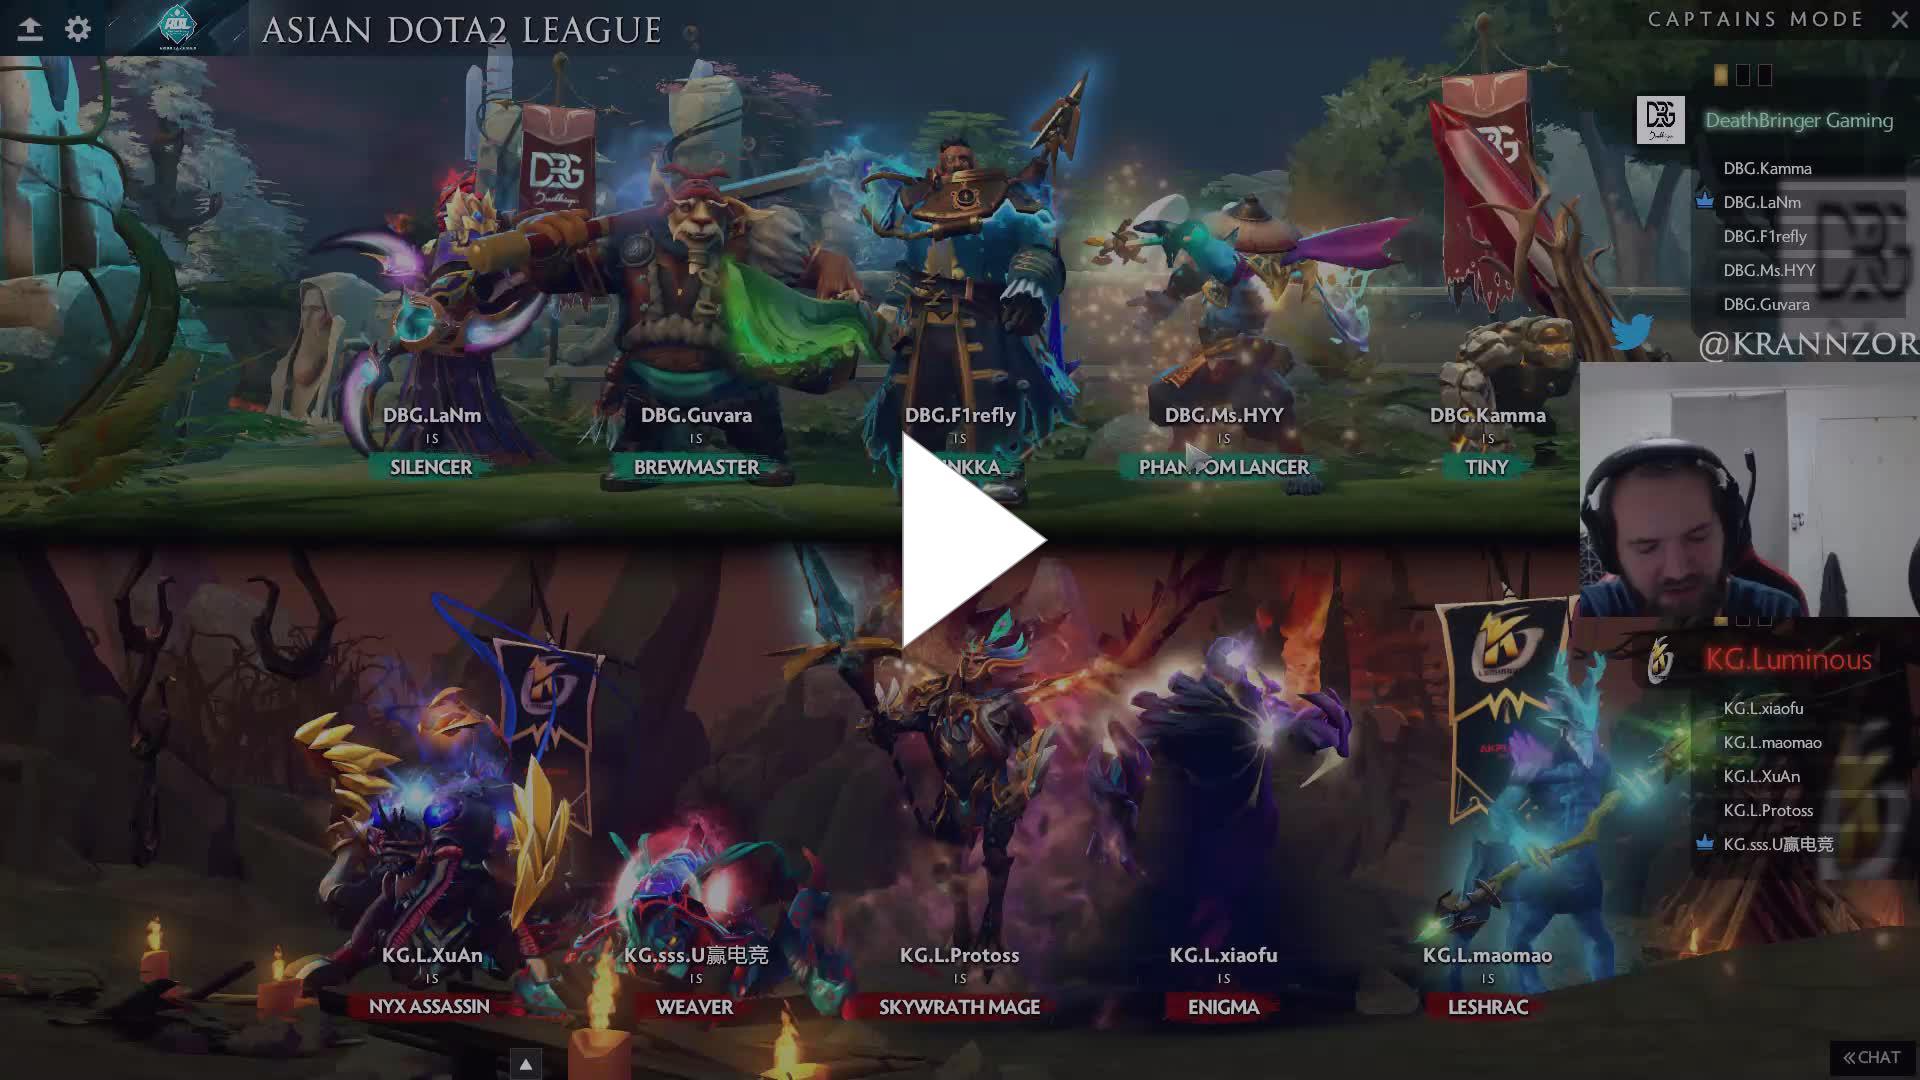 Krannz - [EN] Asian Dota2 League Deathbringer vs Keen Gaming